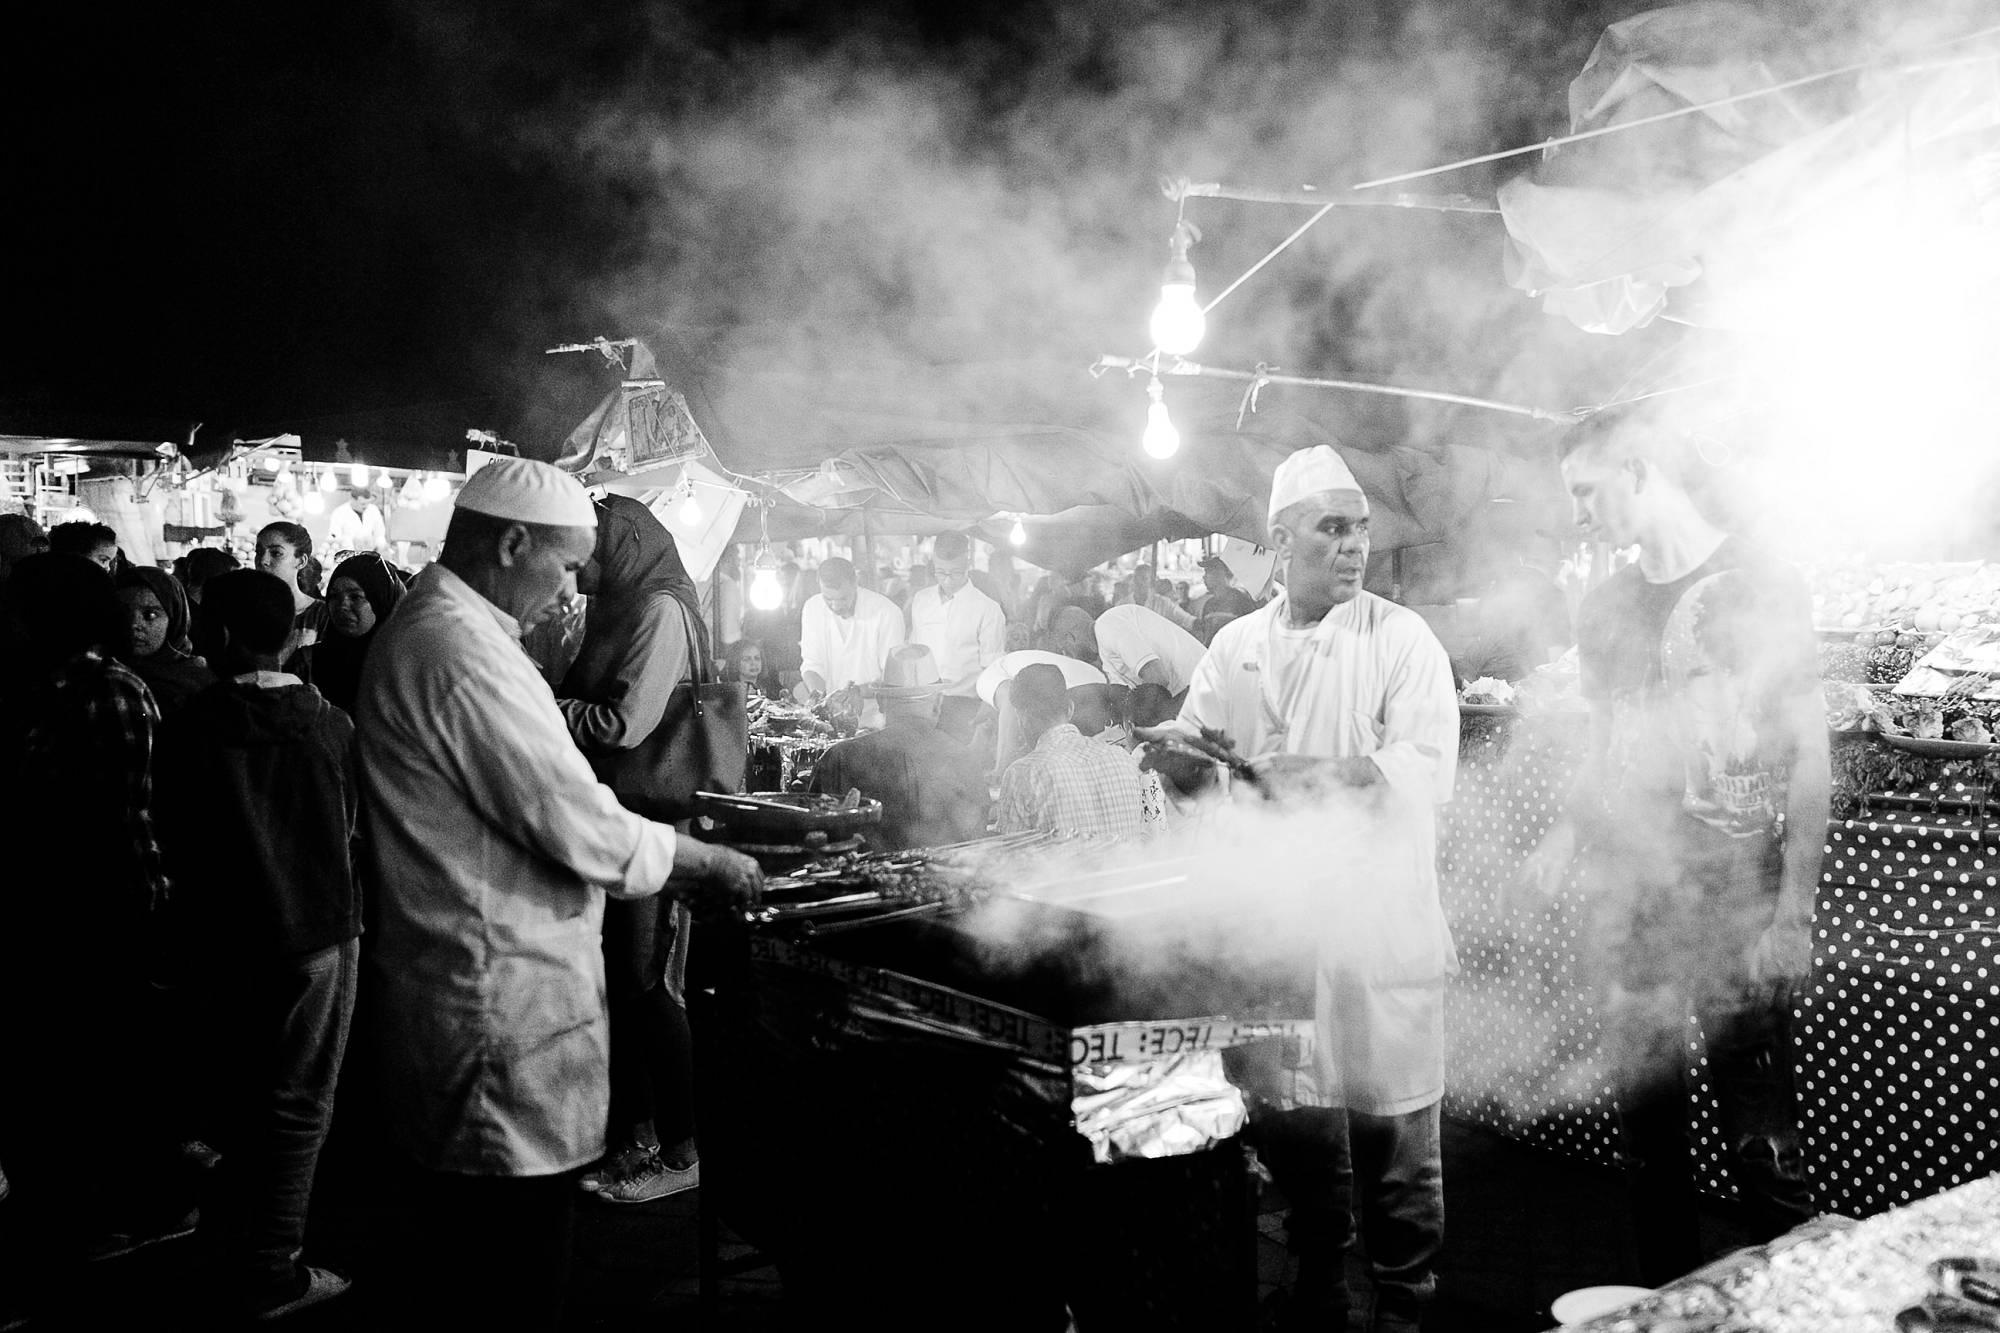 Morocco Marrakech street vendor night black and white photo